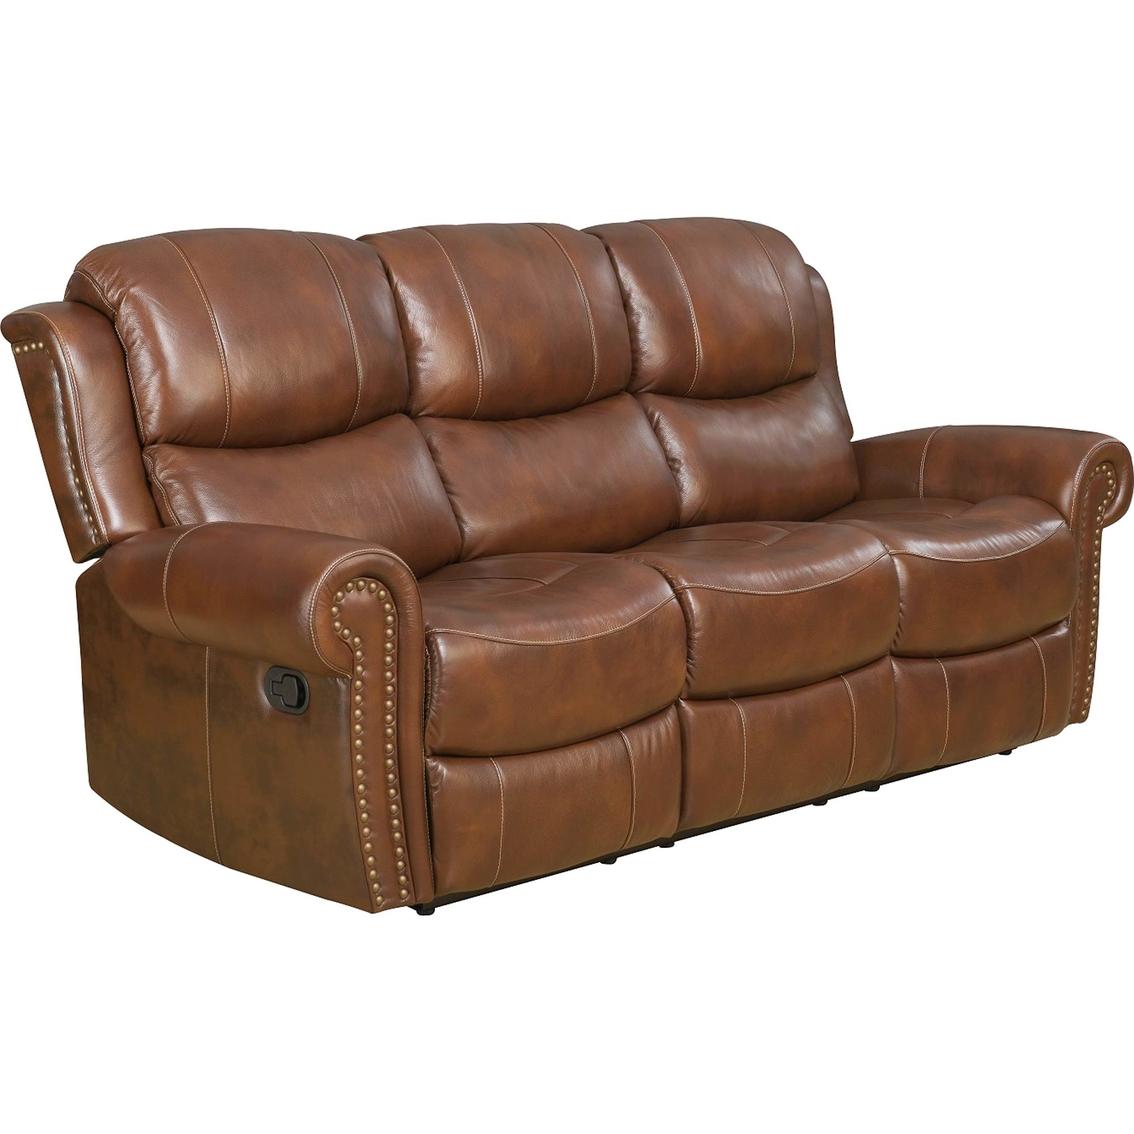 Klaussner Alomar Leather Power Reclining Sofa   Sofas ...